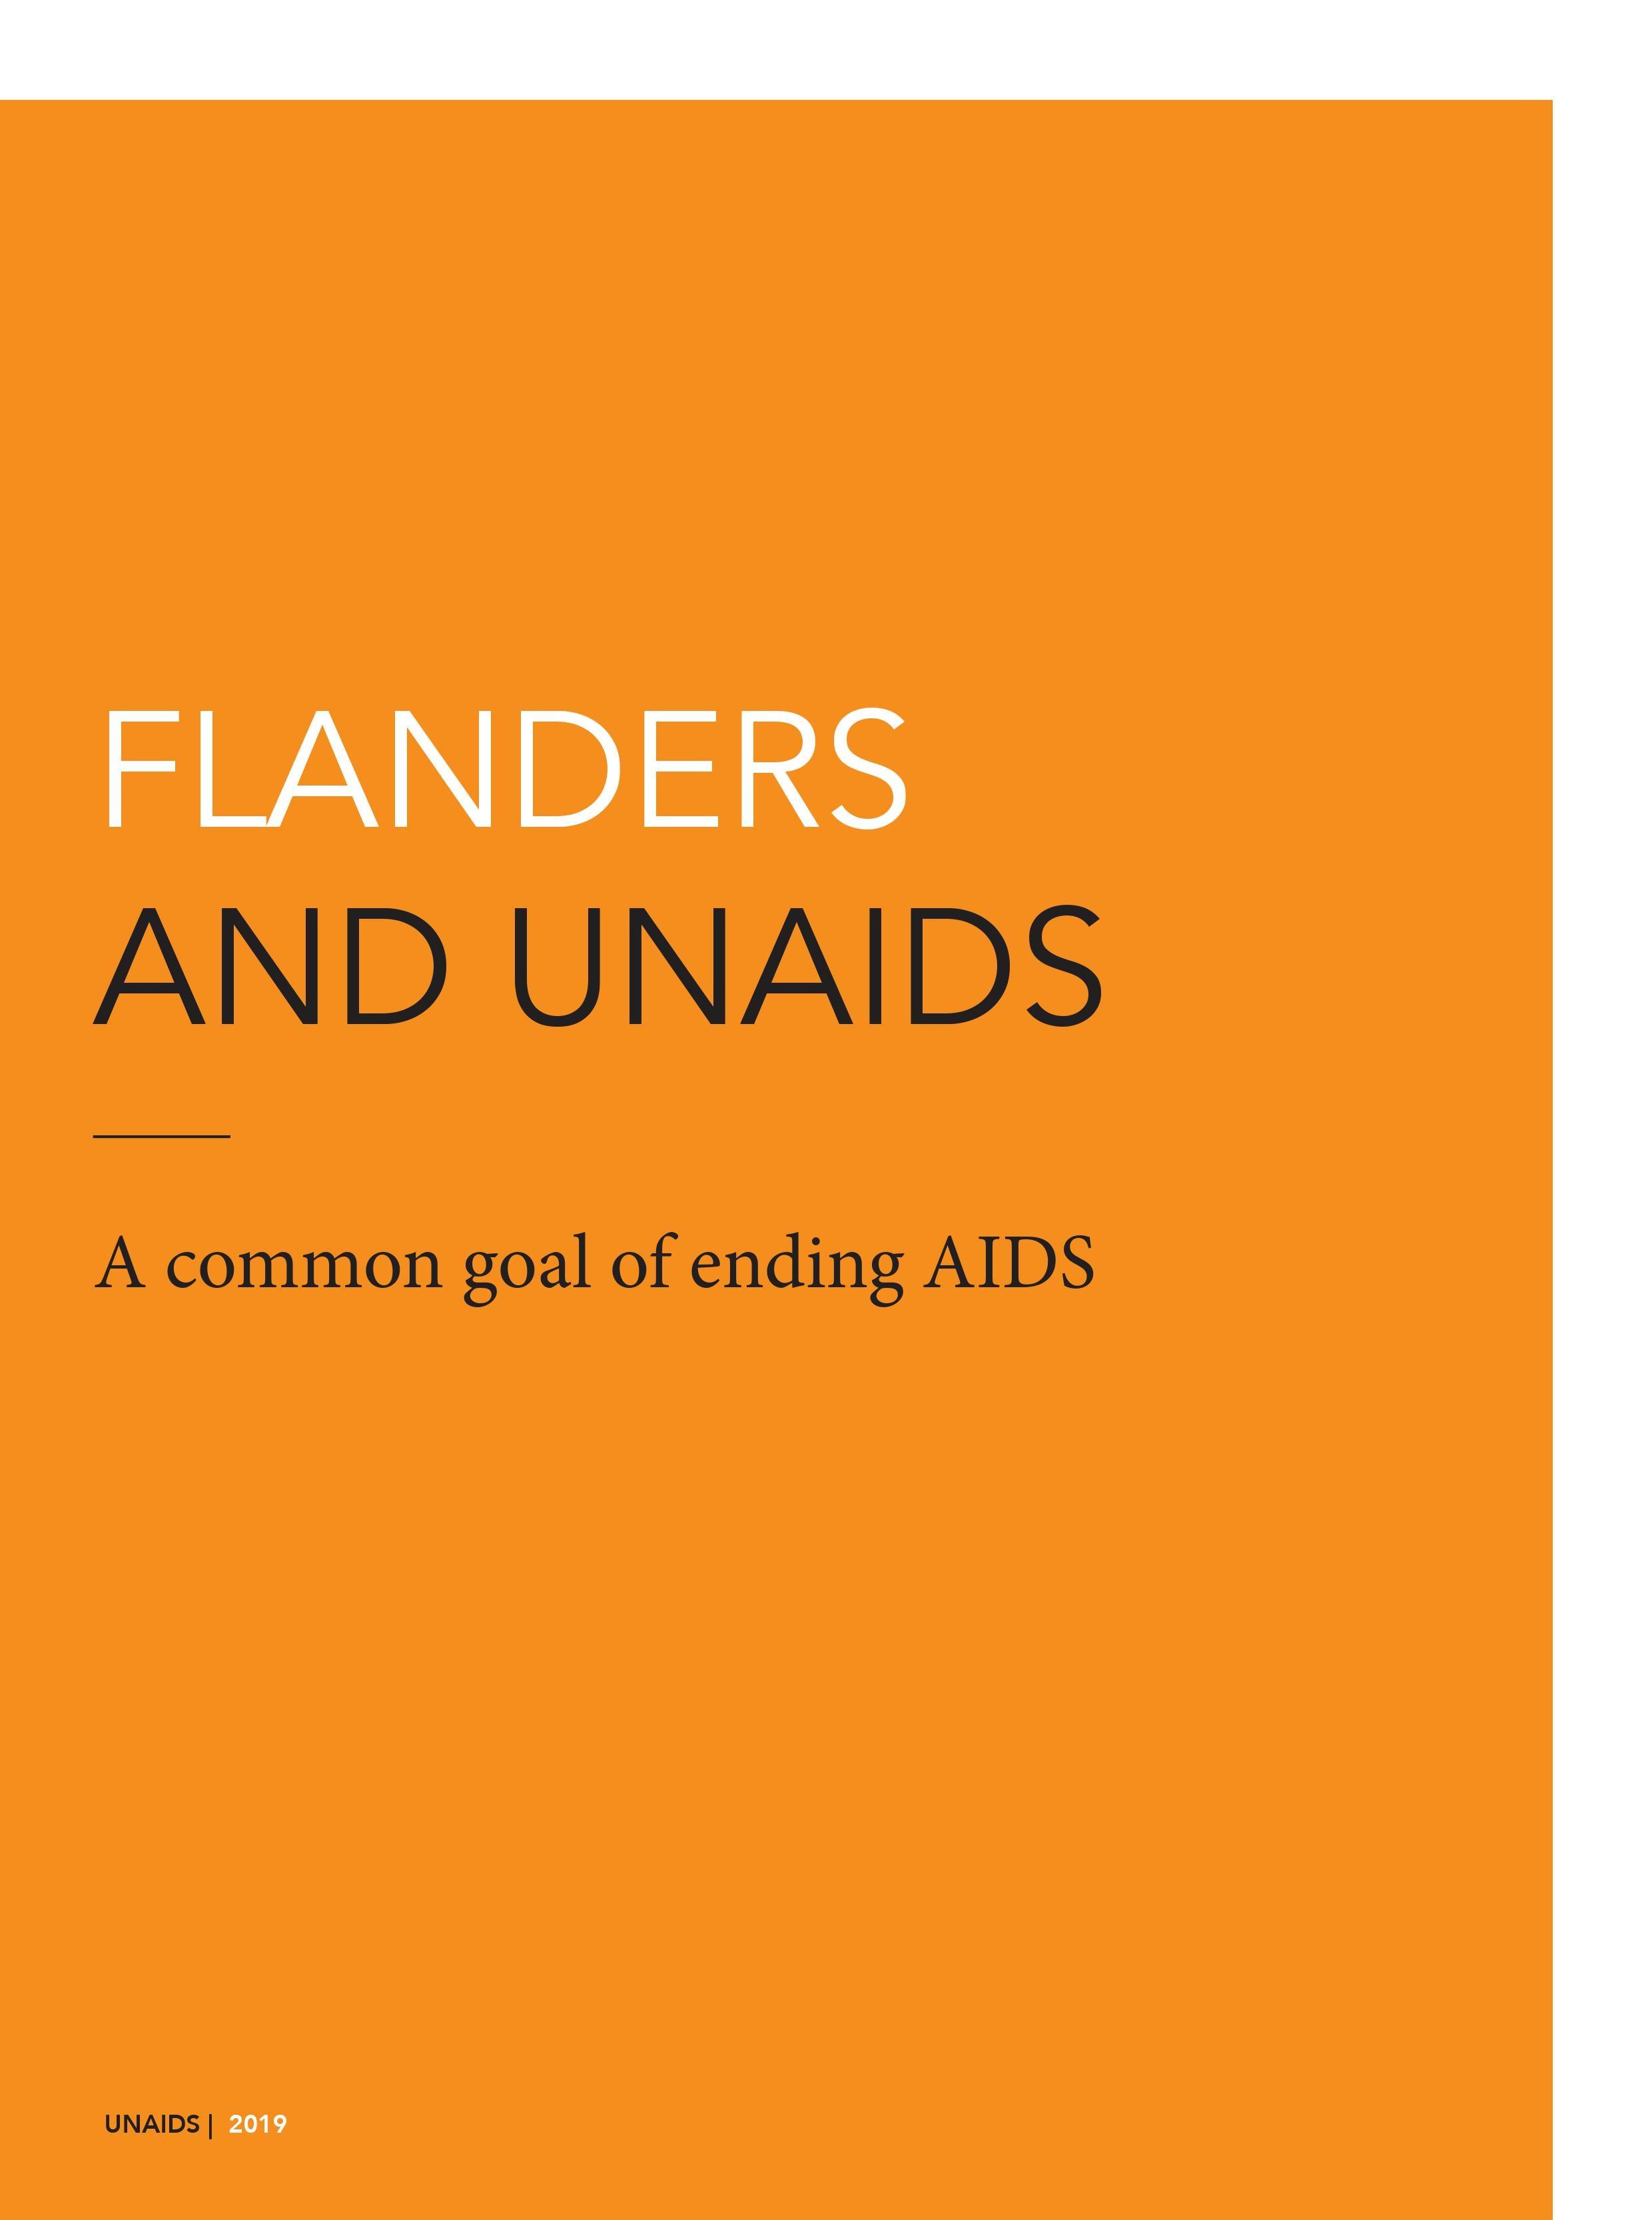 Flanders and UNAIDS